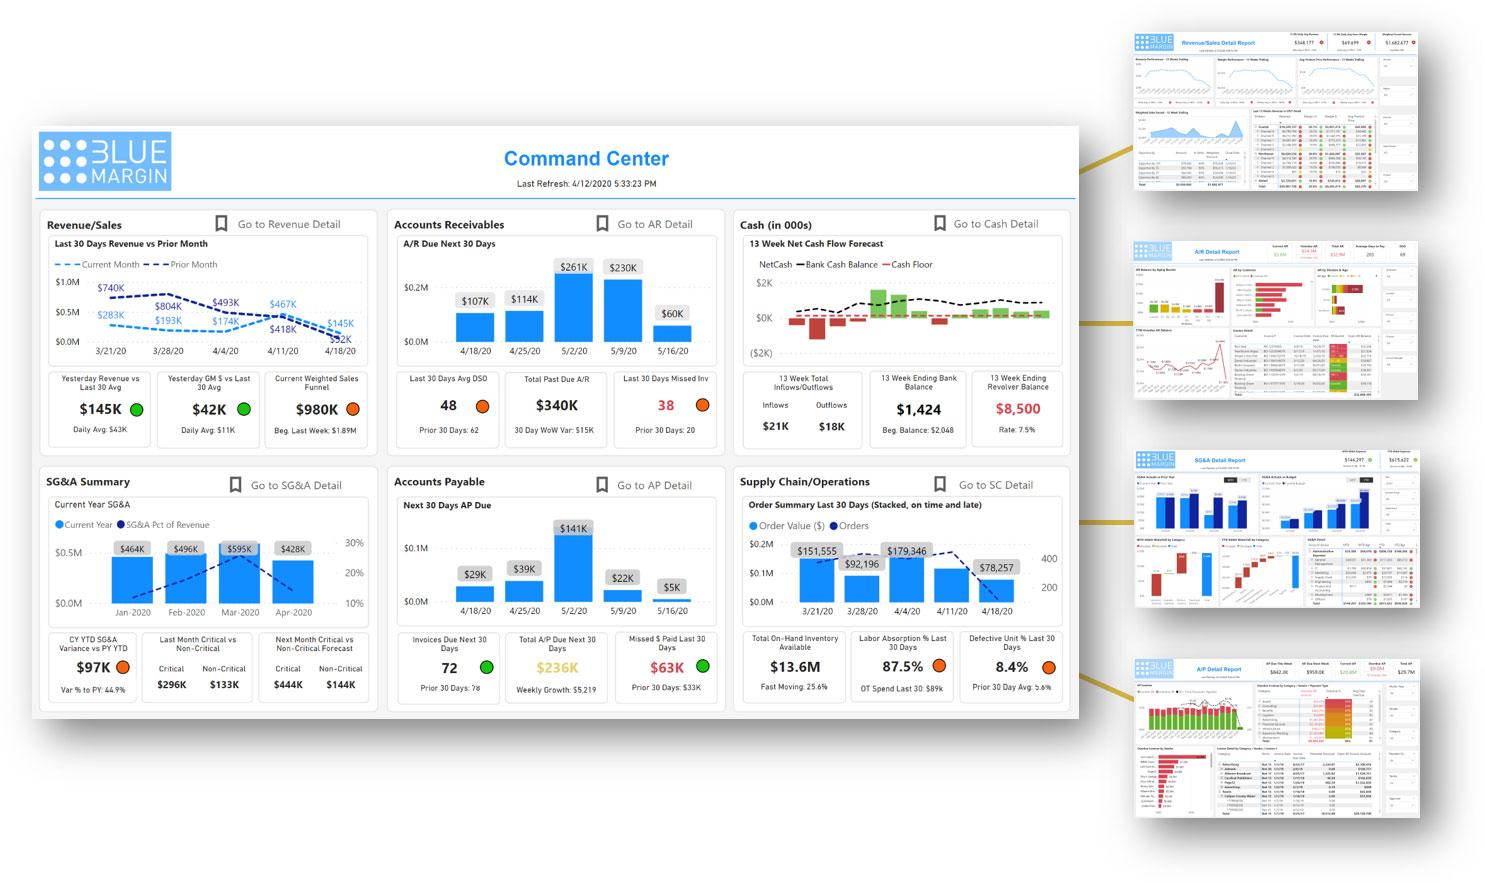 Command Center Dashboard